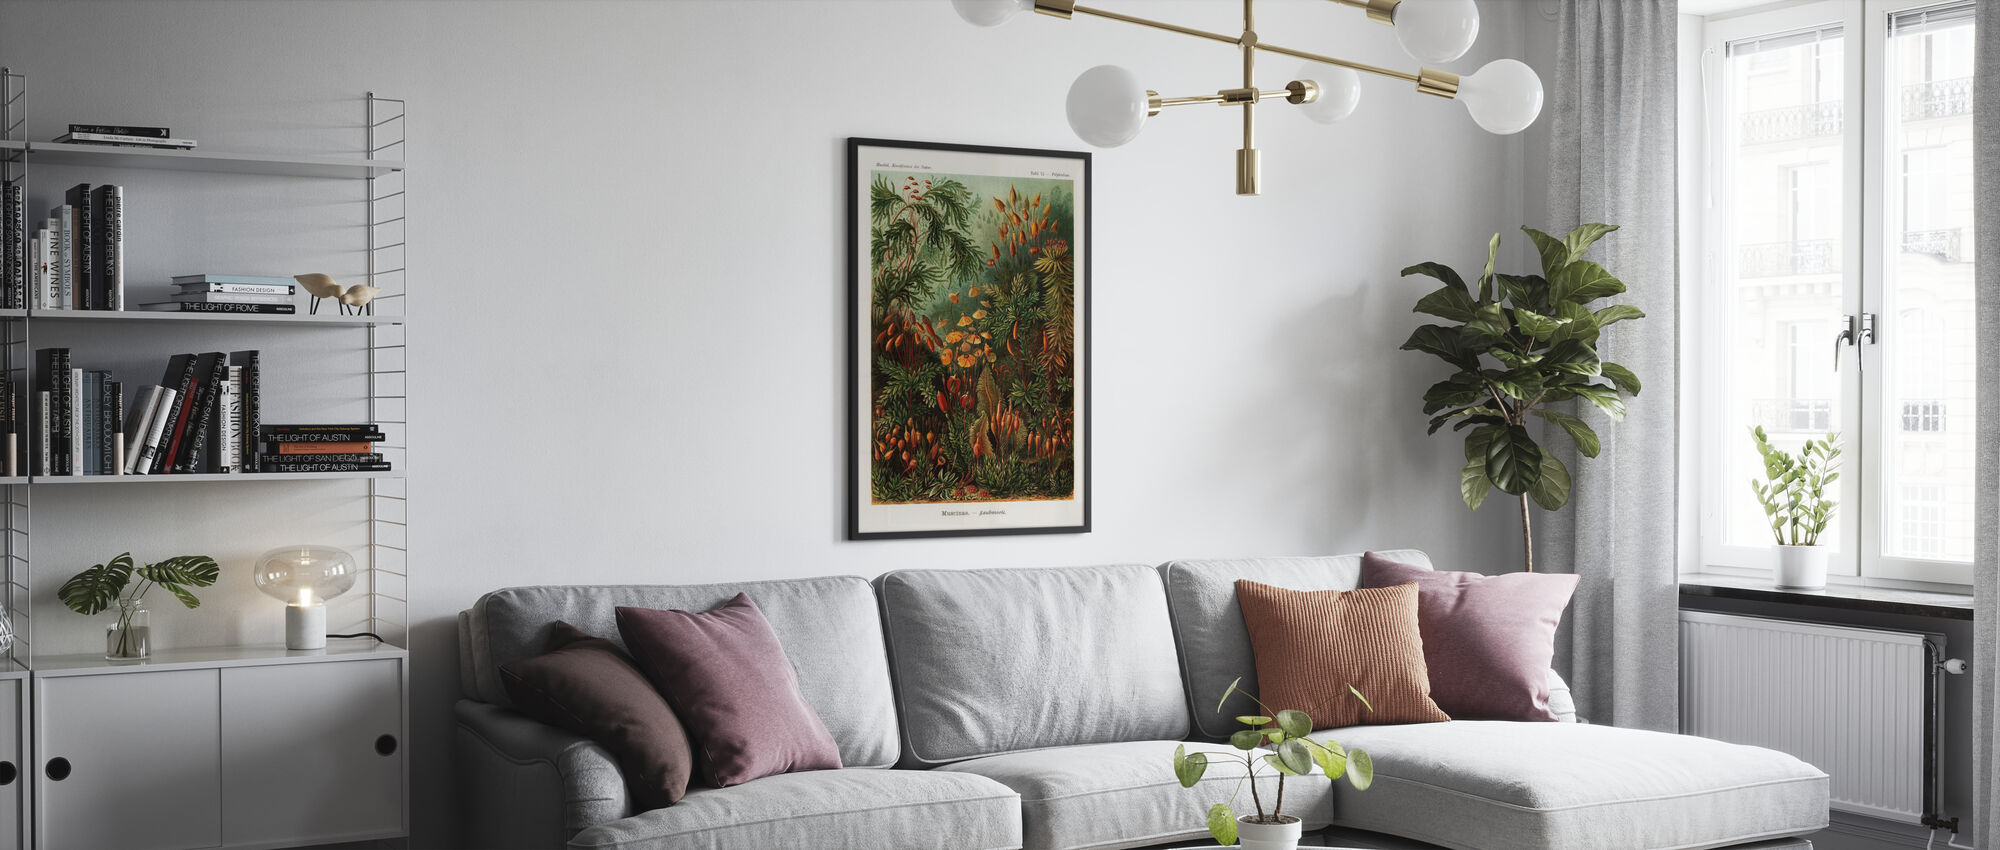 Muscinae Moss kunstformer - Ernst Haeckel - Plakat - Stue